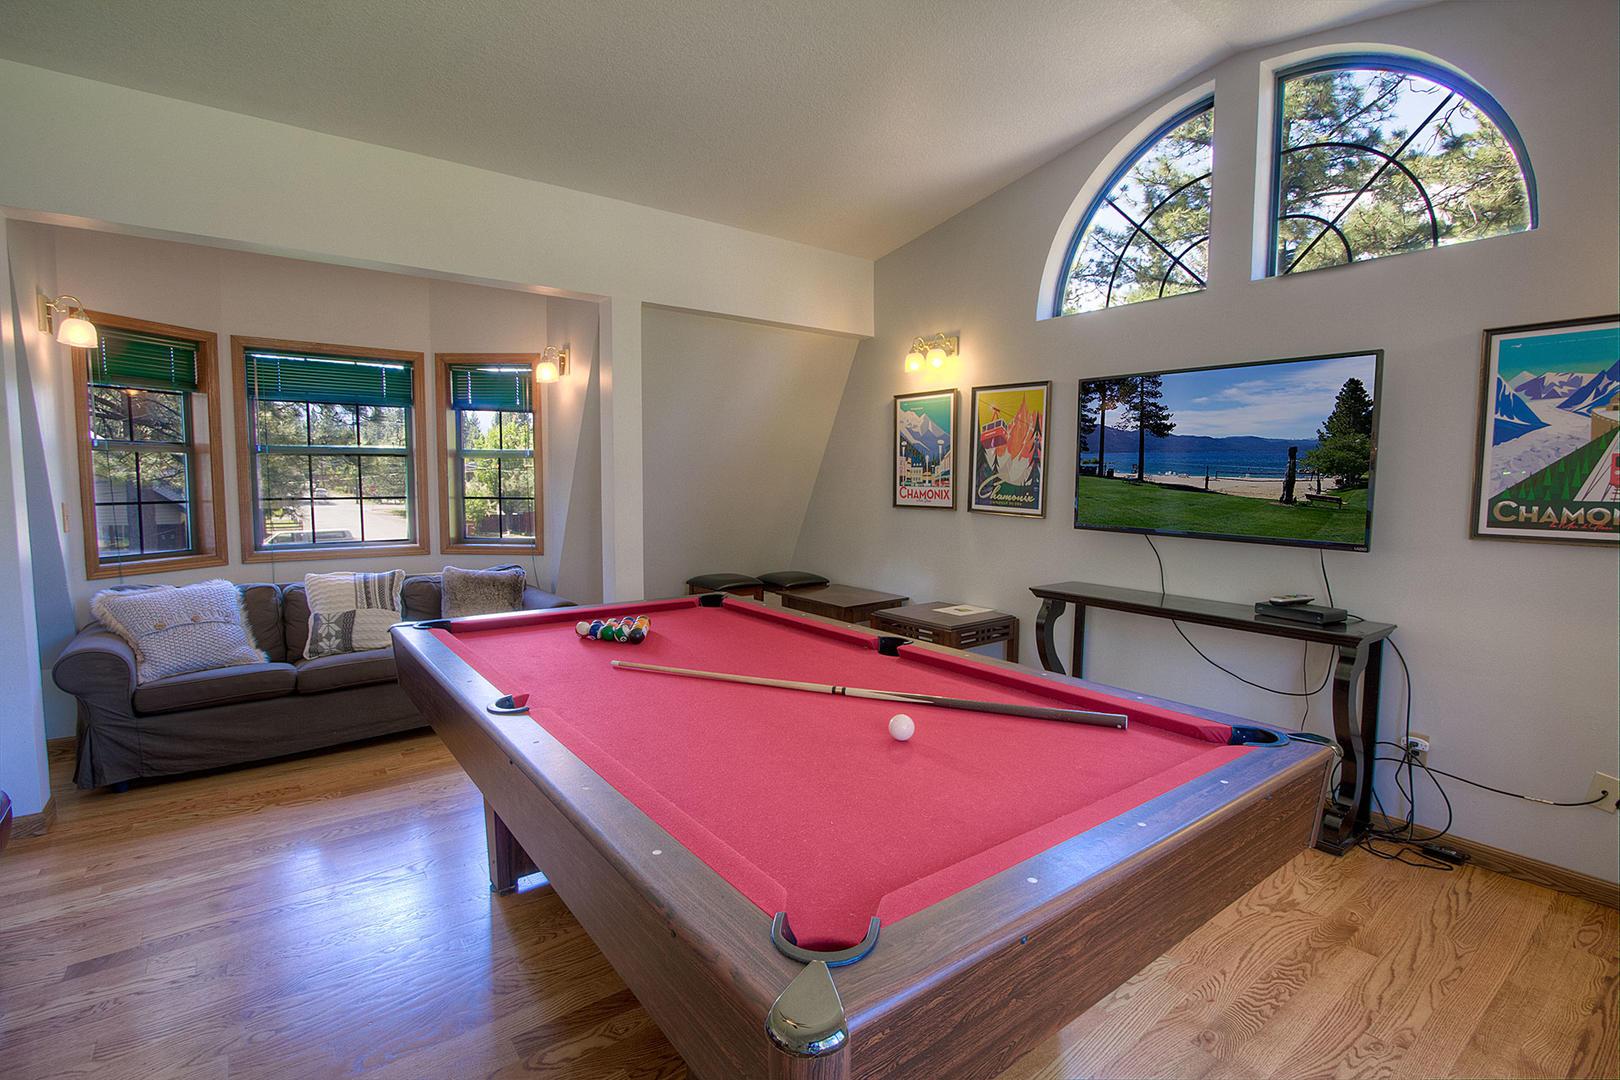 cyh1024 pool table